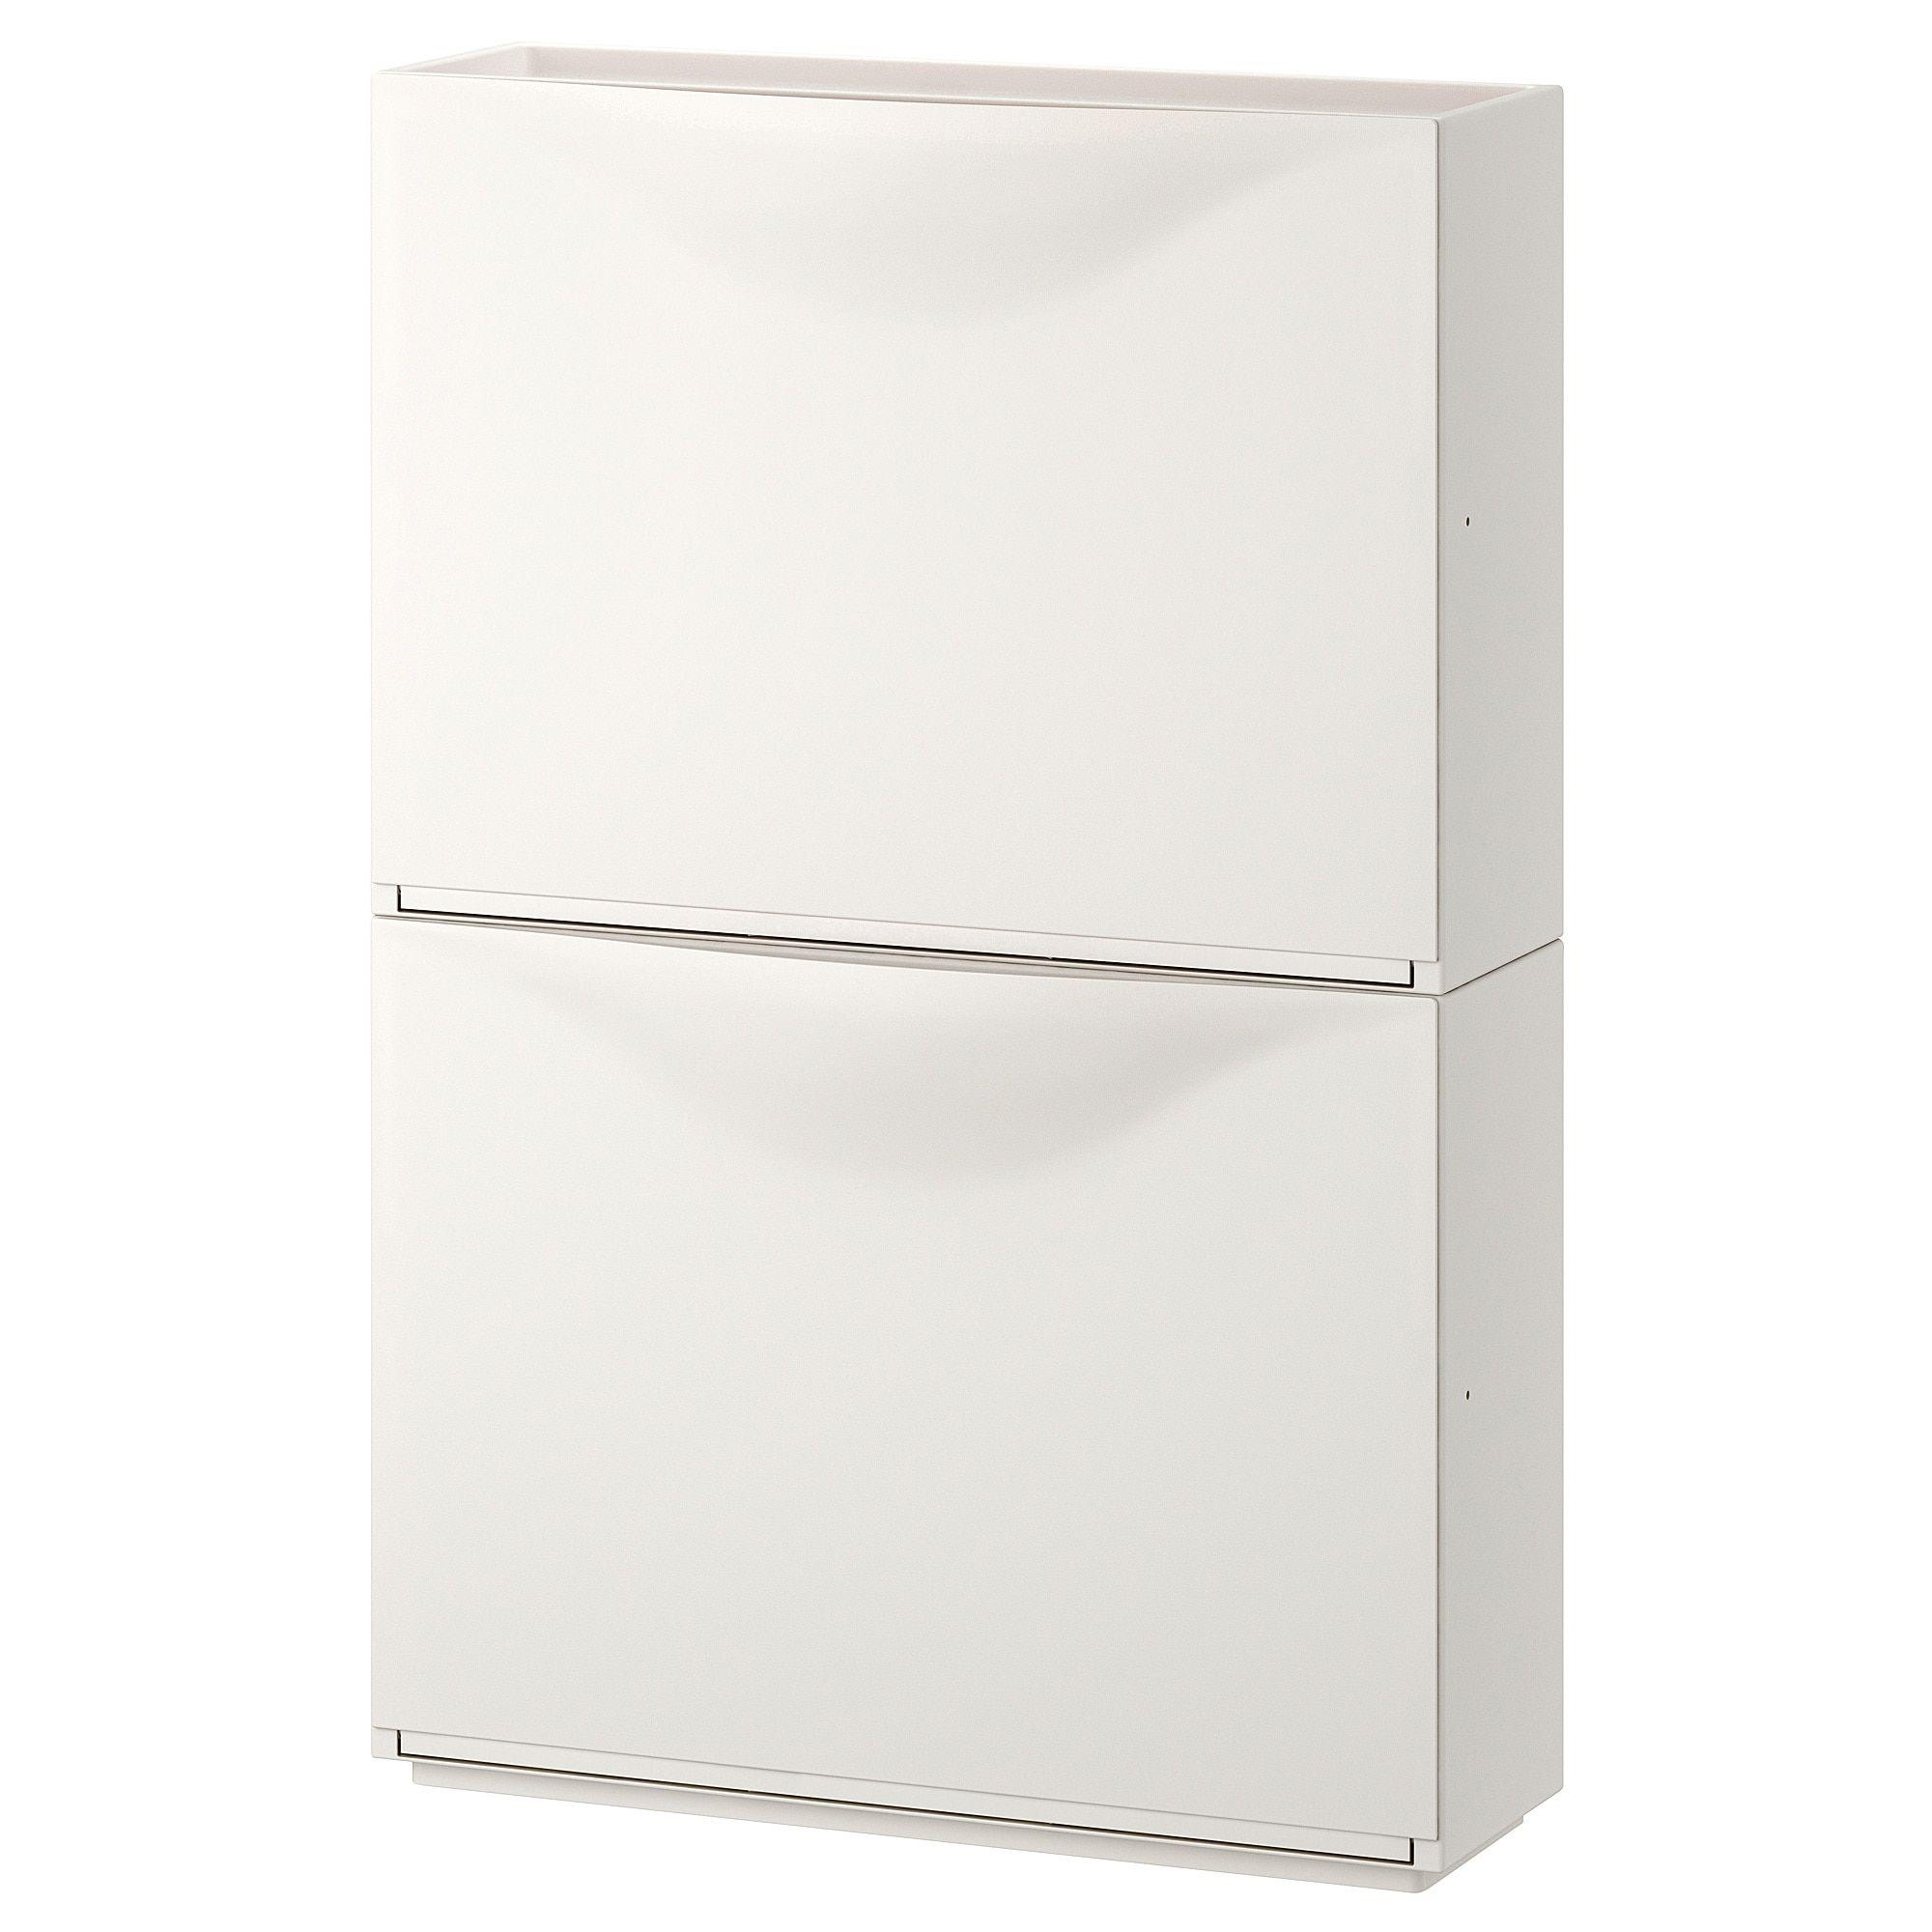 Ikea Trones White Shoe Storage Cabinet Shoe Storage Cabinet